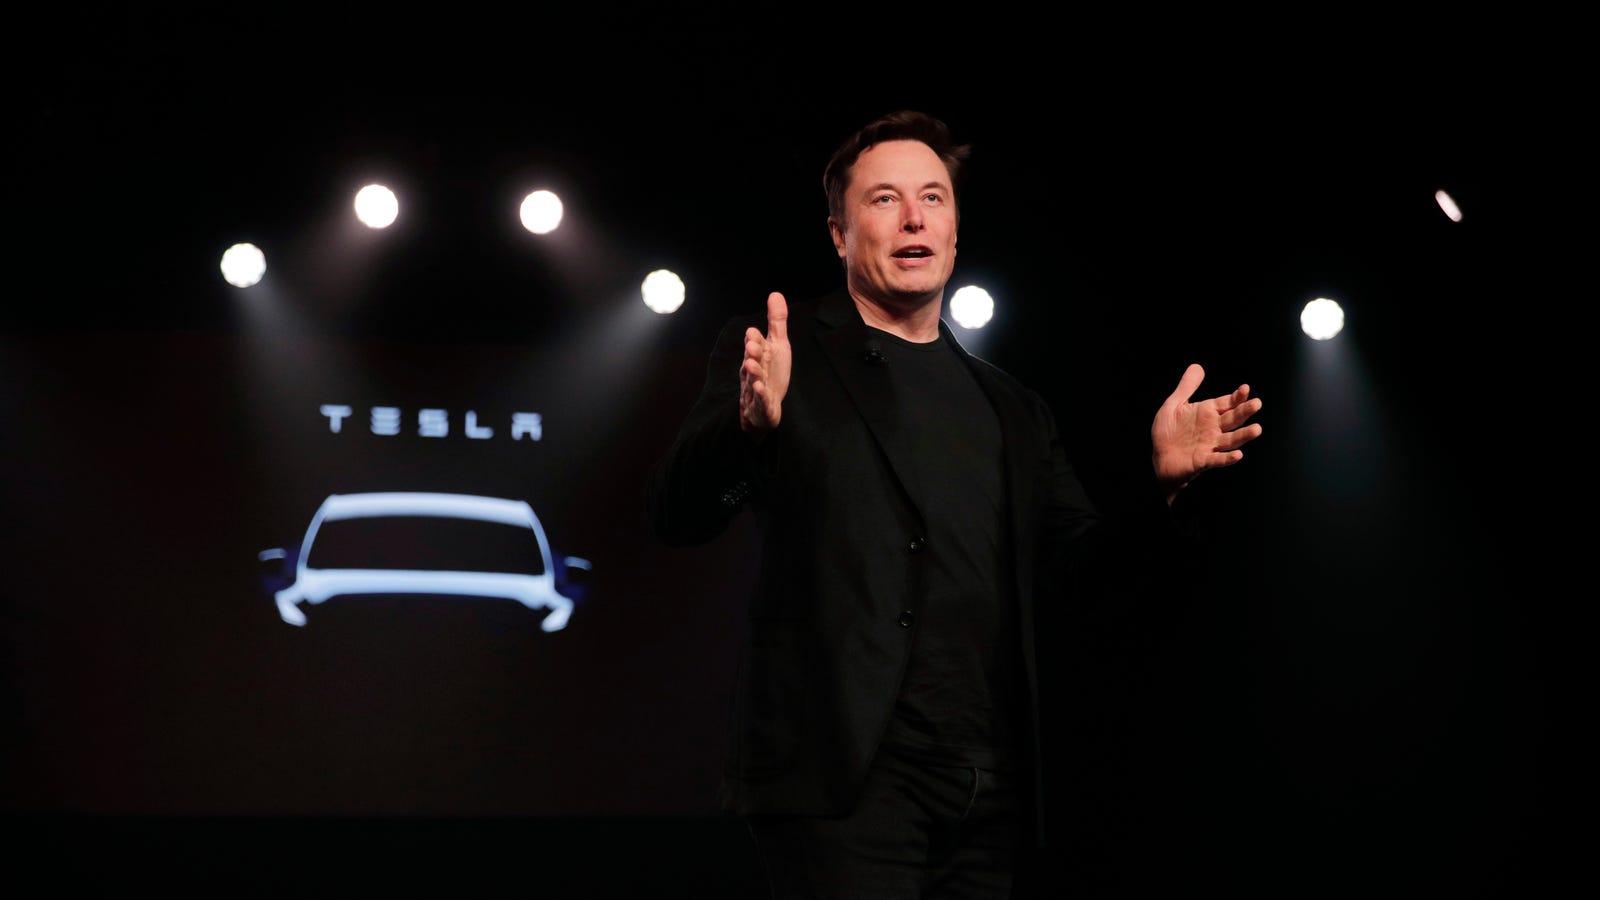 Stuff Elon Musk Said About Tesla Autonomous Cars on Monday, Ranked